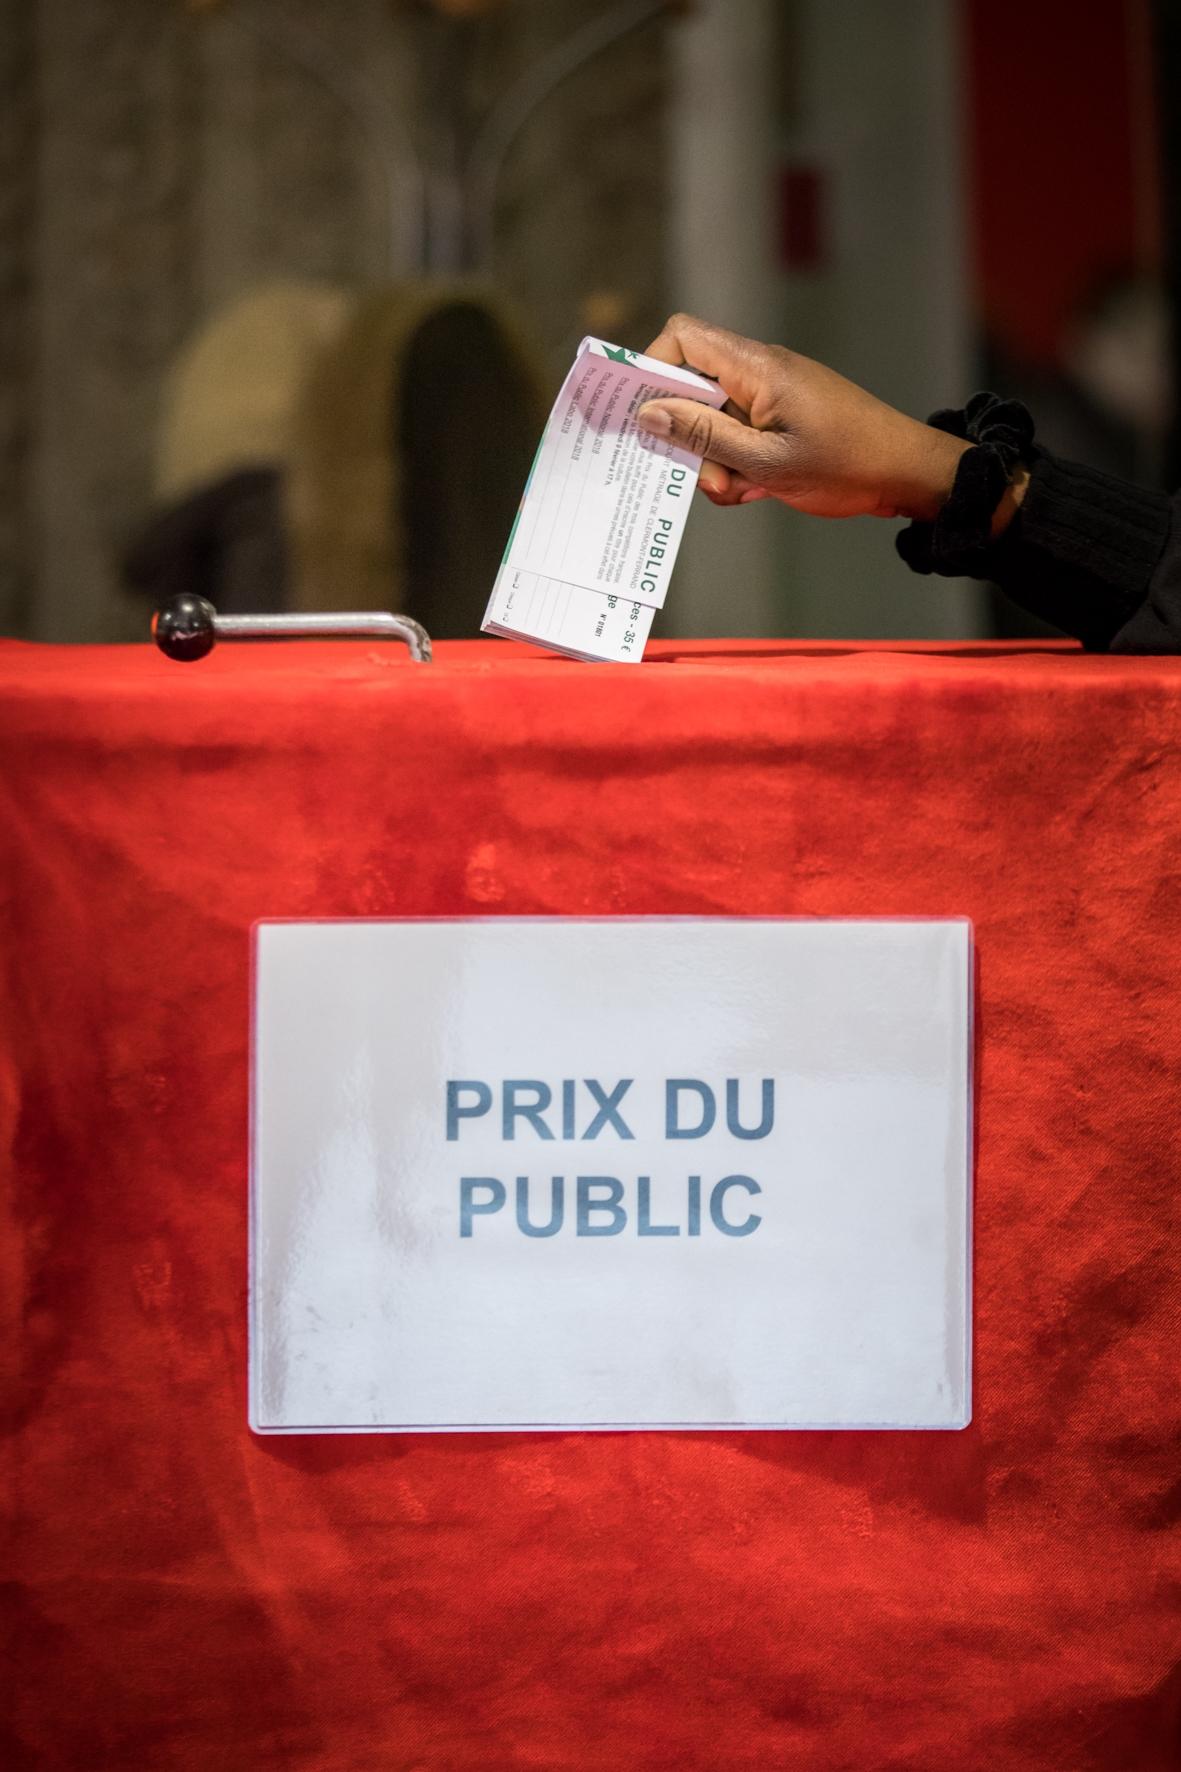 MDC-prix public 1